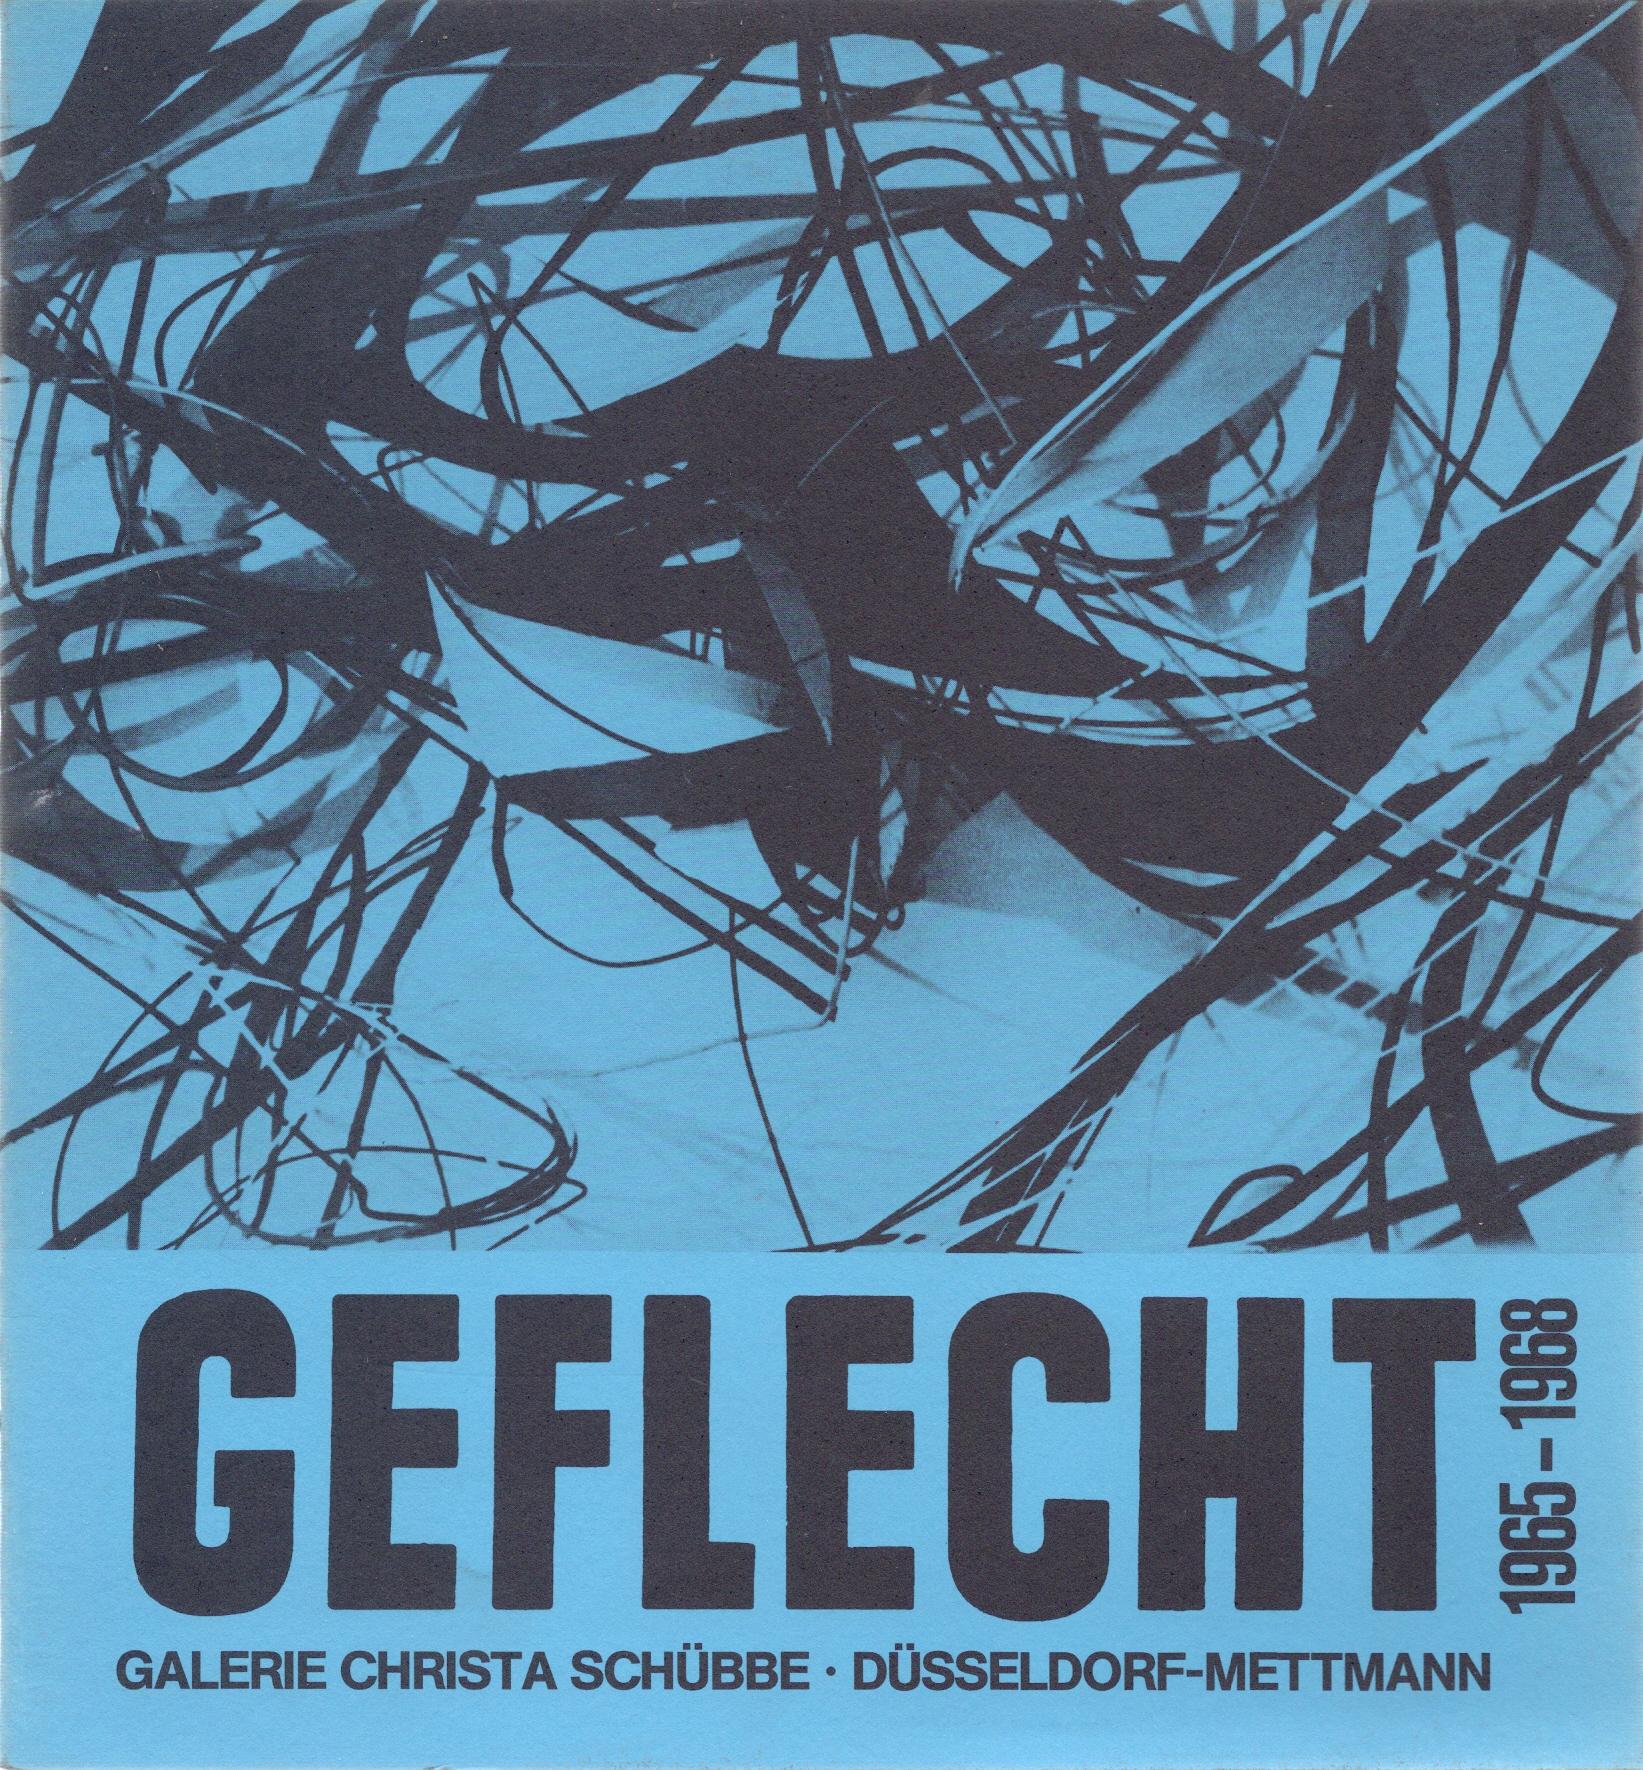 Geflecht  Antiobjekte 1965-67 , Galerie Christa Schübbe